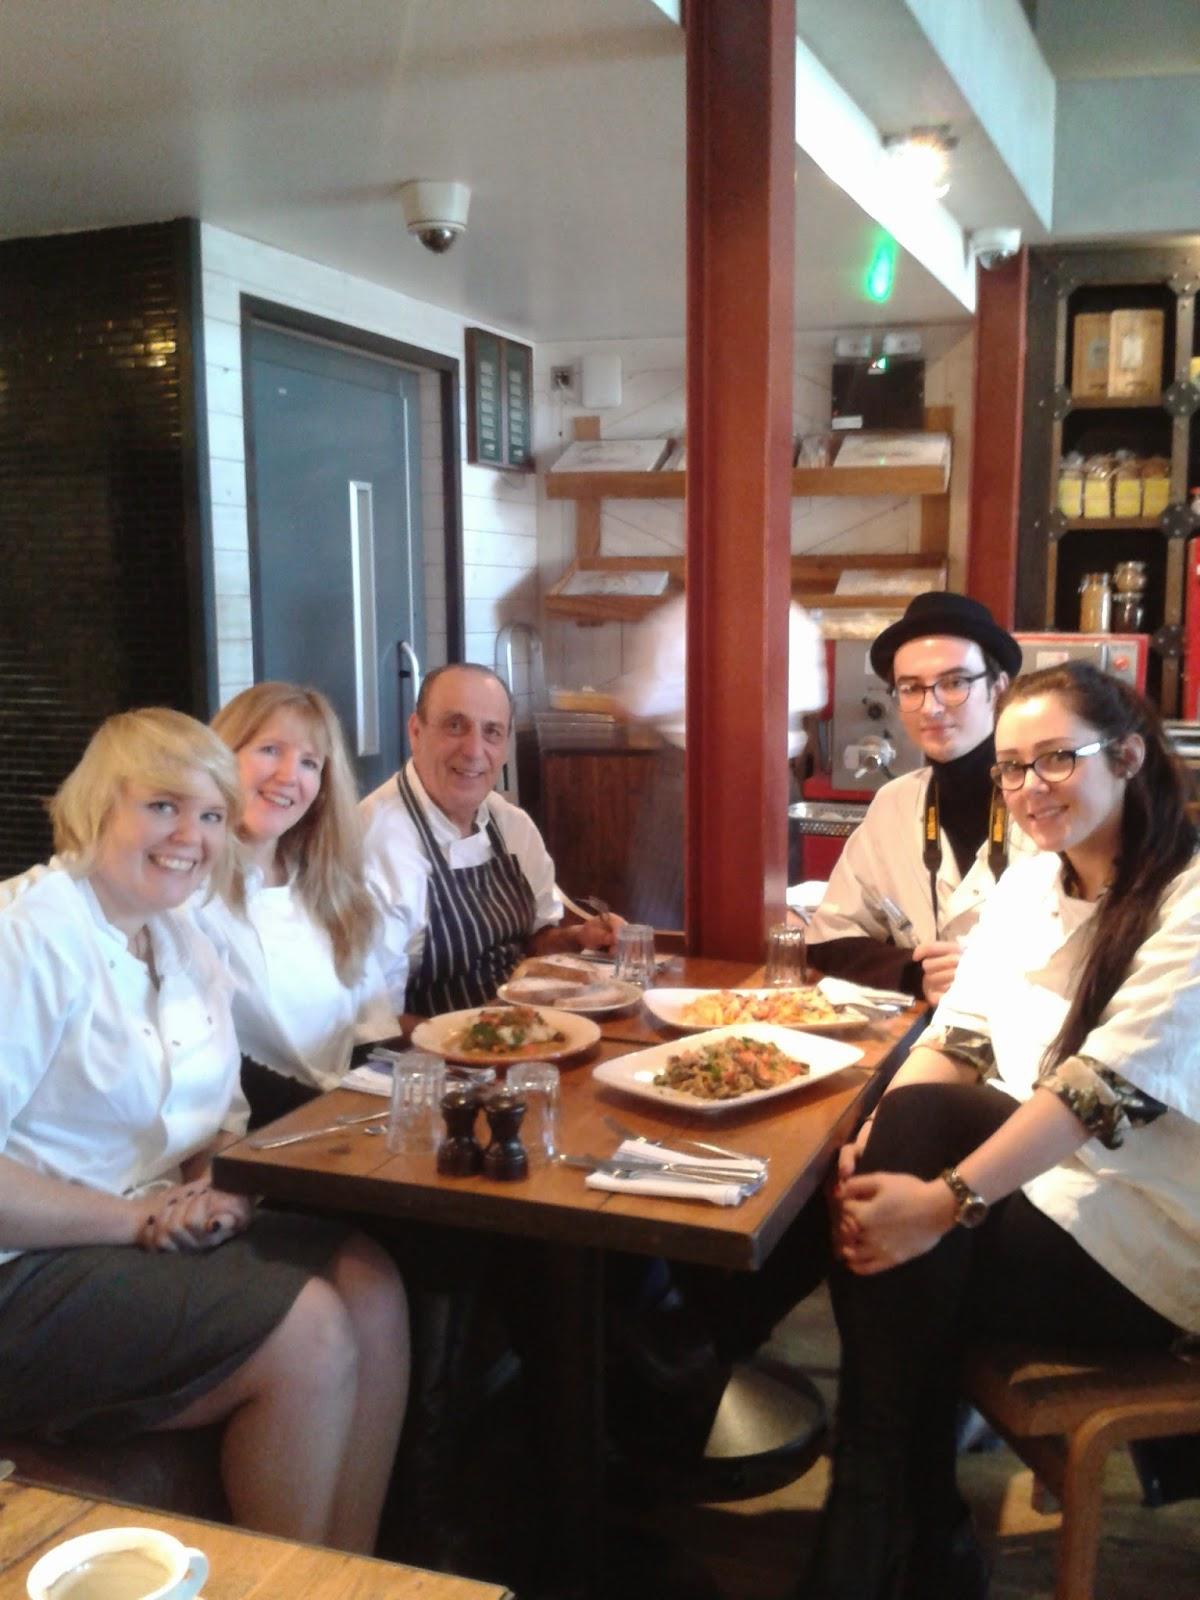 Pasta Masterclass with Gennaro Contaldo at Jamie Oliver's Restaurant, Cardiff